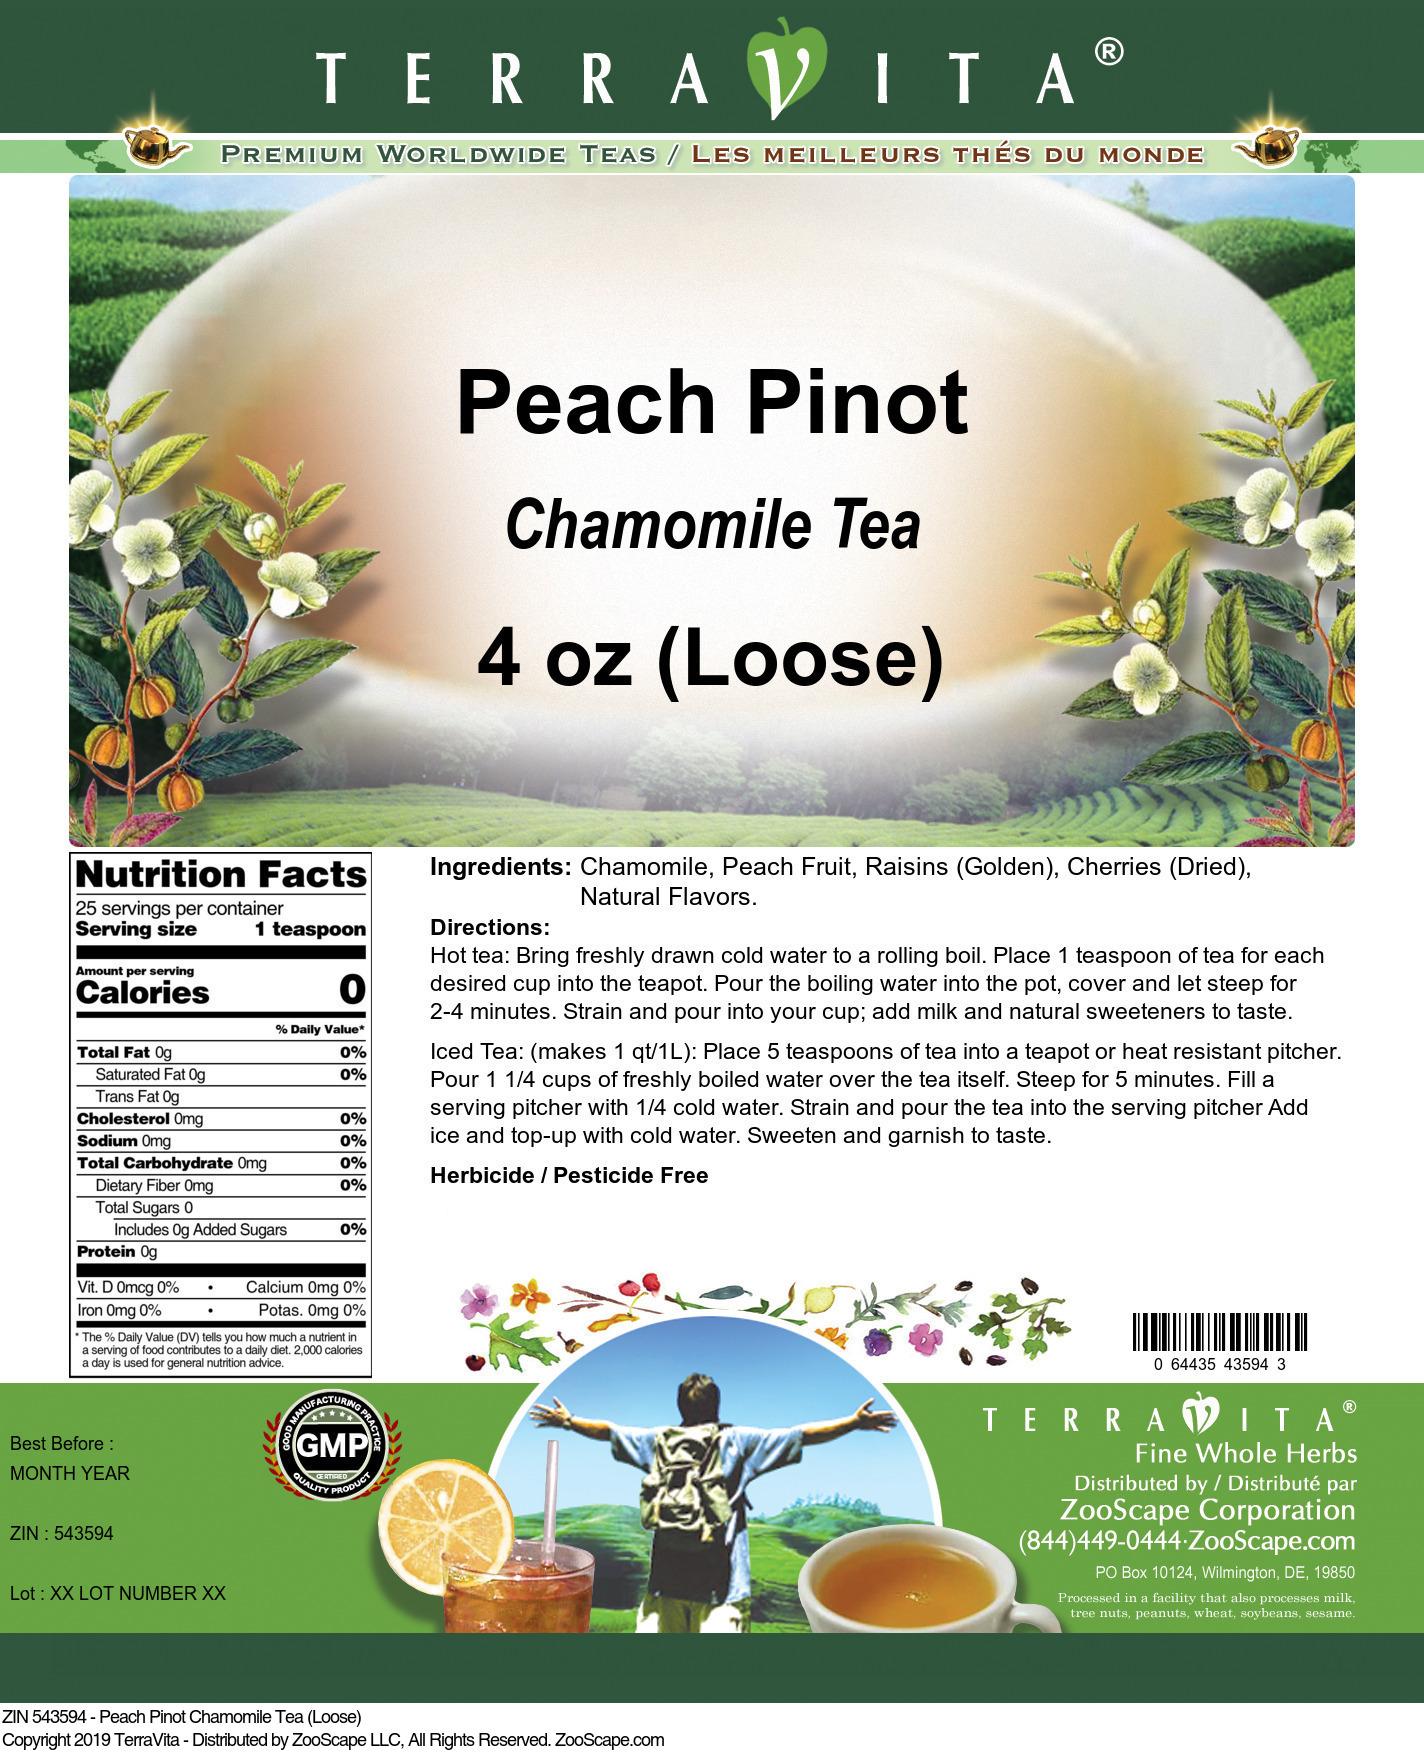 Peach Pinot Chamomile Tea (Loose)